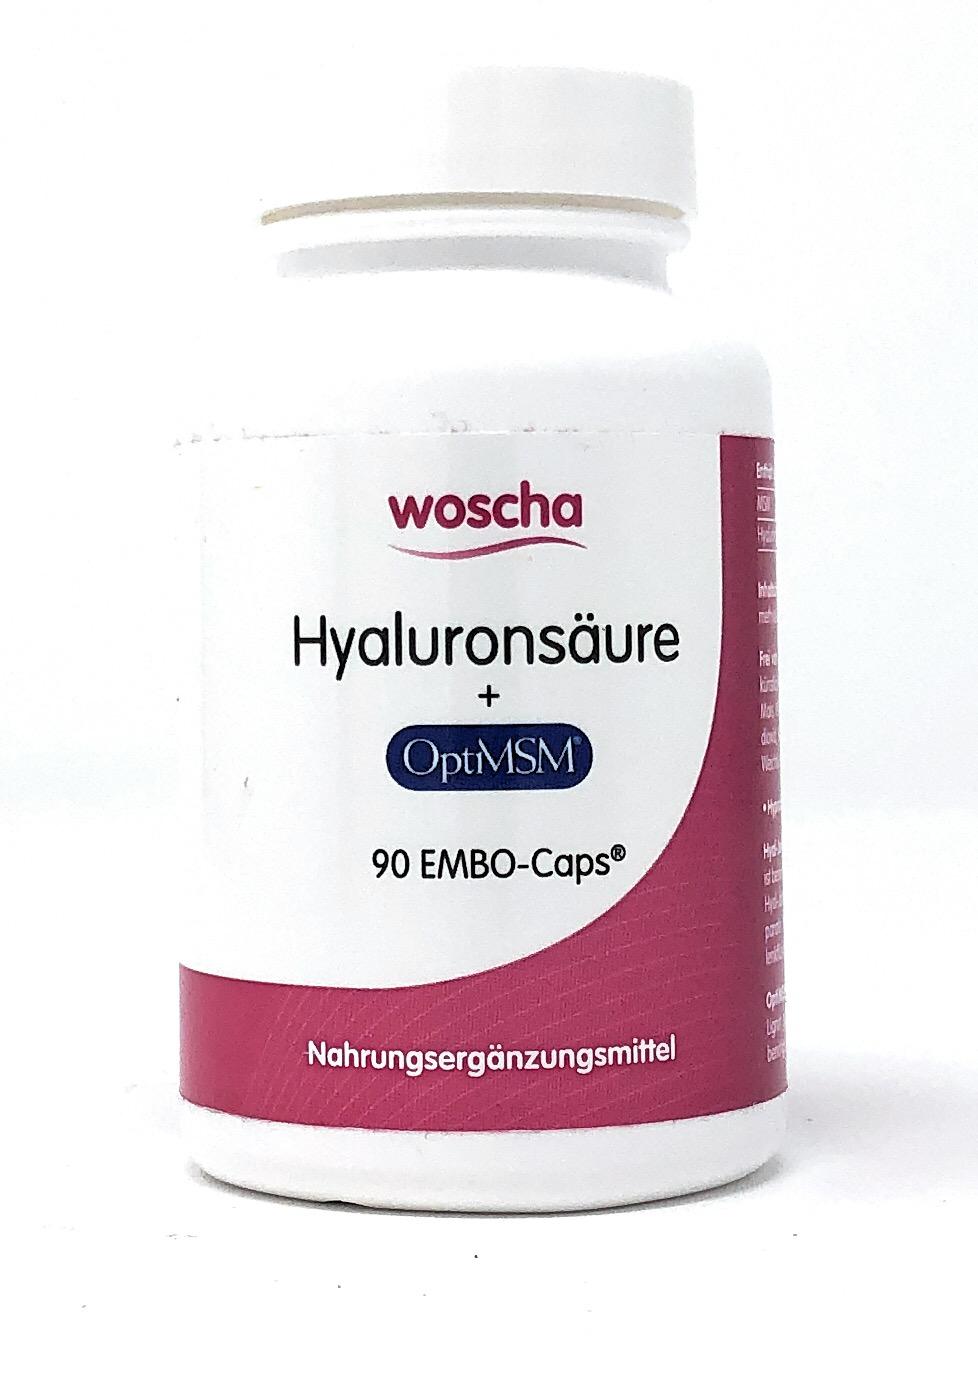 woscha Hyaluronsäure mit MSM 90 EMBO-CAPS® (53g)